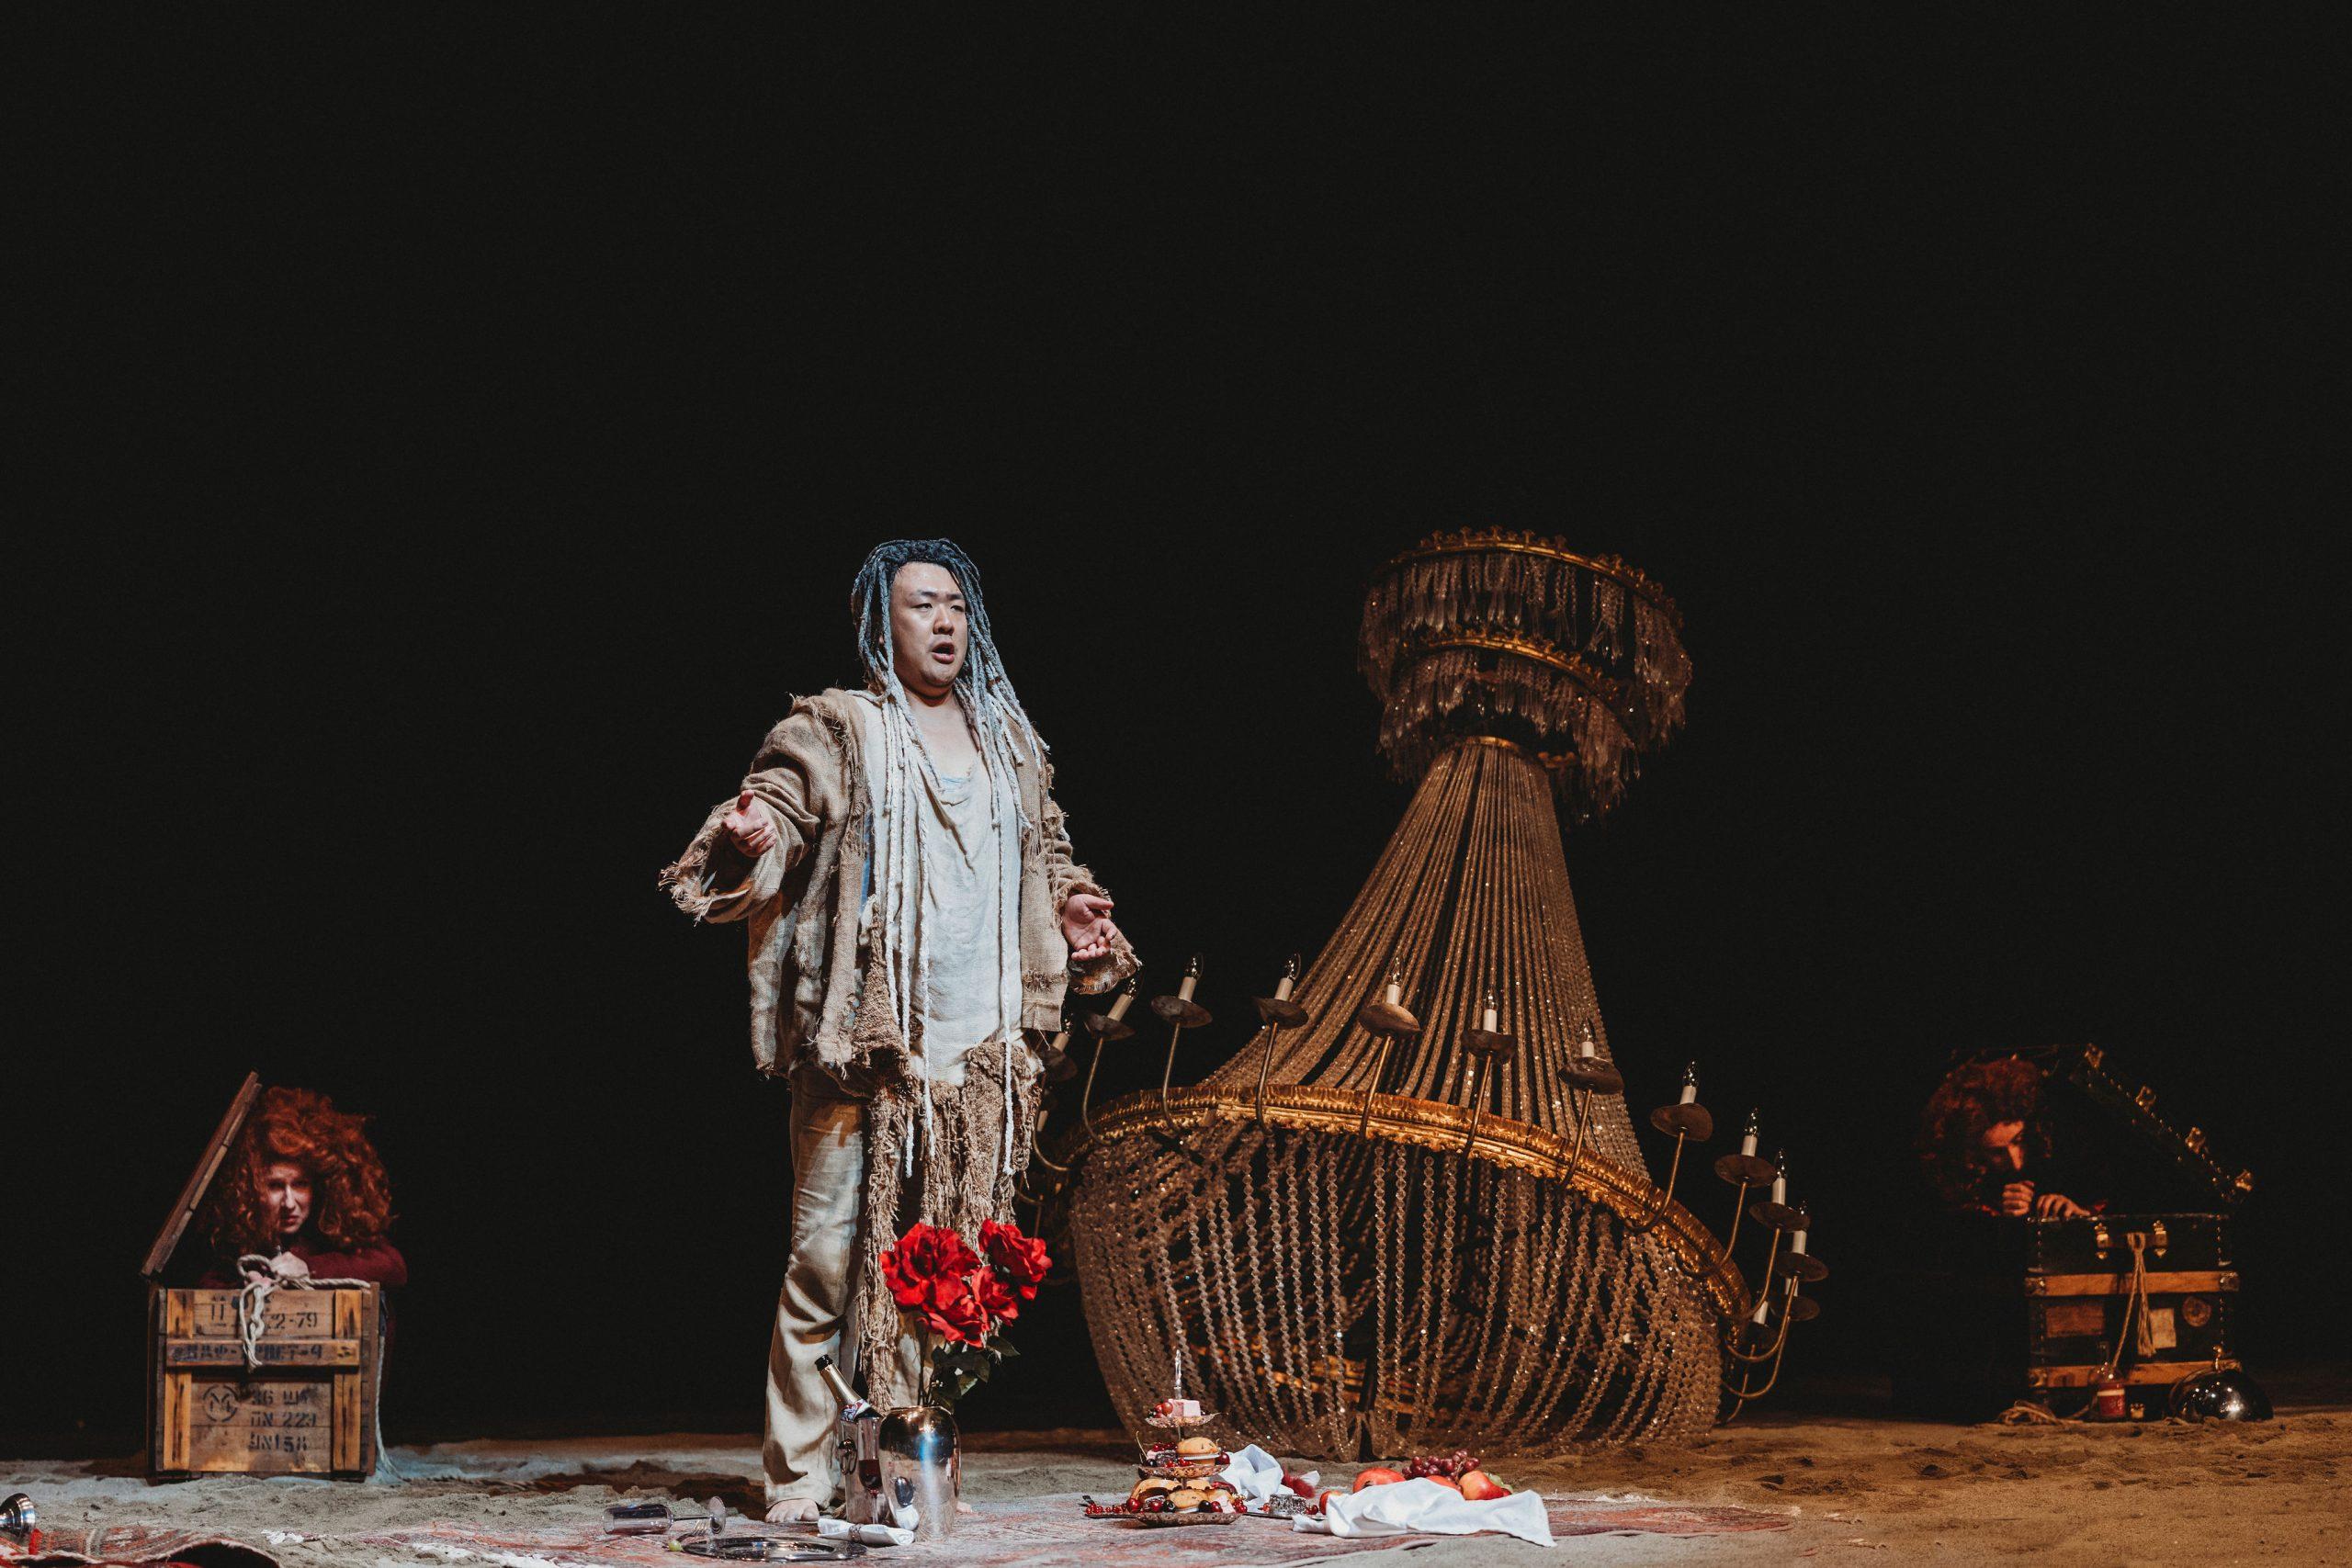 Blauer Salon   Junge Oper Rhein-Main   Caliban   Tiroler Festspiele Erl   OPERiAMO   Bildnachweis: Xiomara Bender